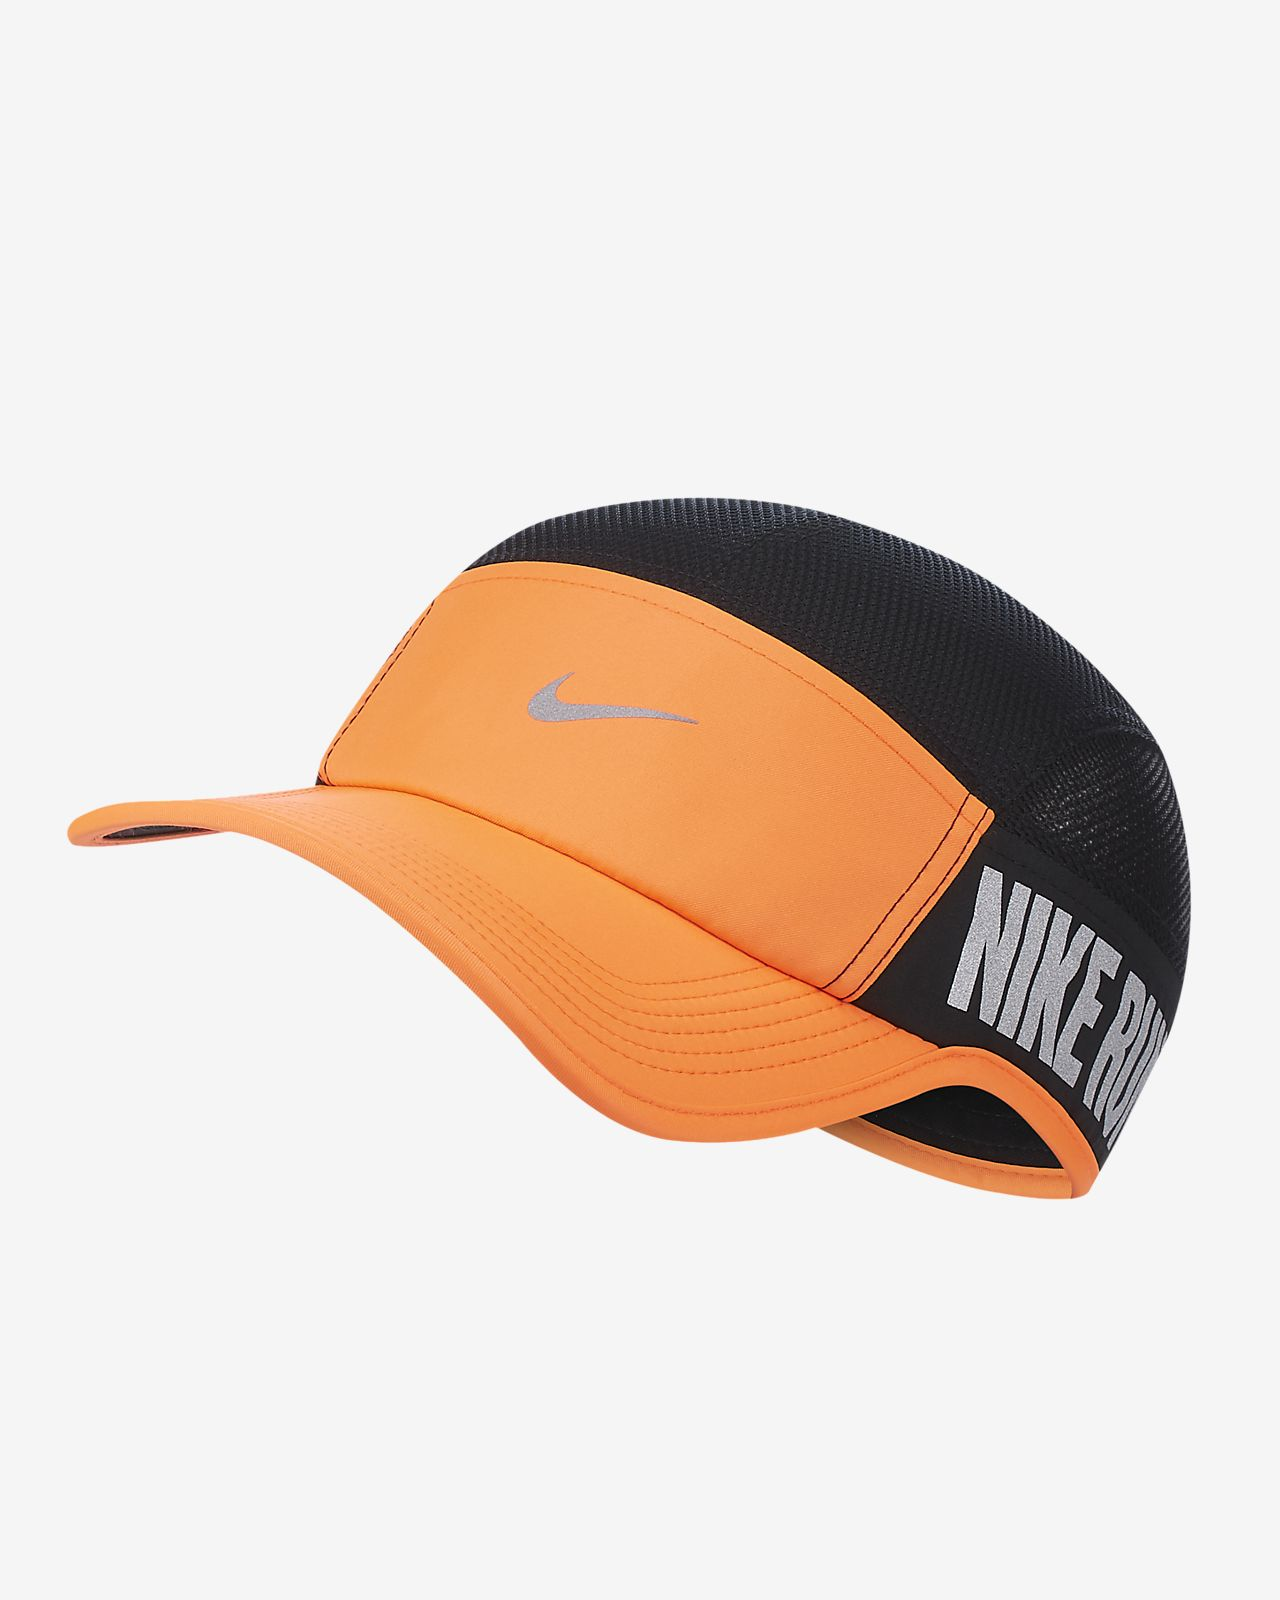 6482ec0c812488 Low Resolution Nike Run AW84 Hat Nike Run AW84 Hat